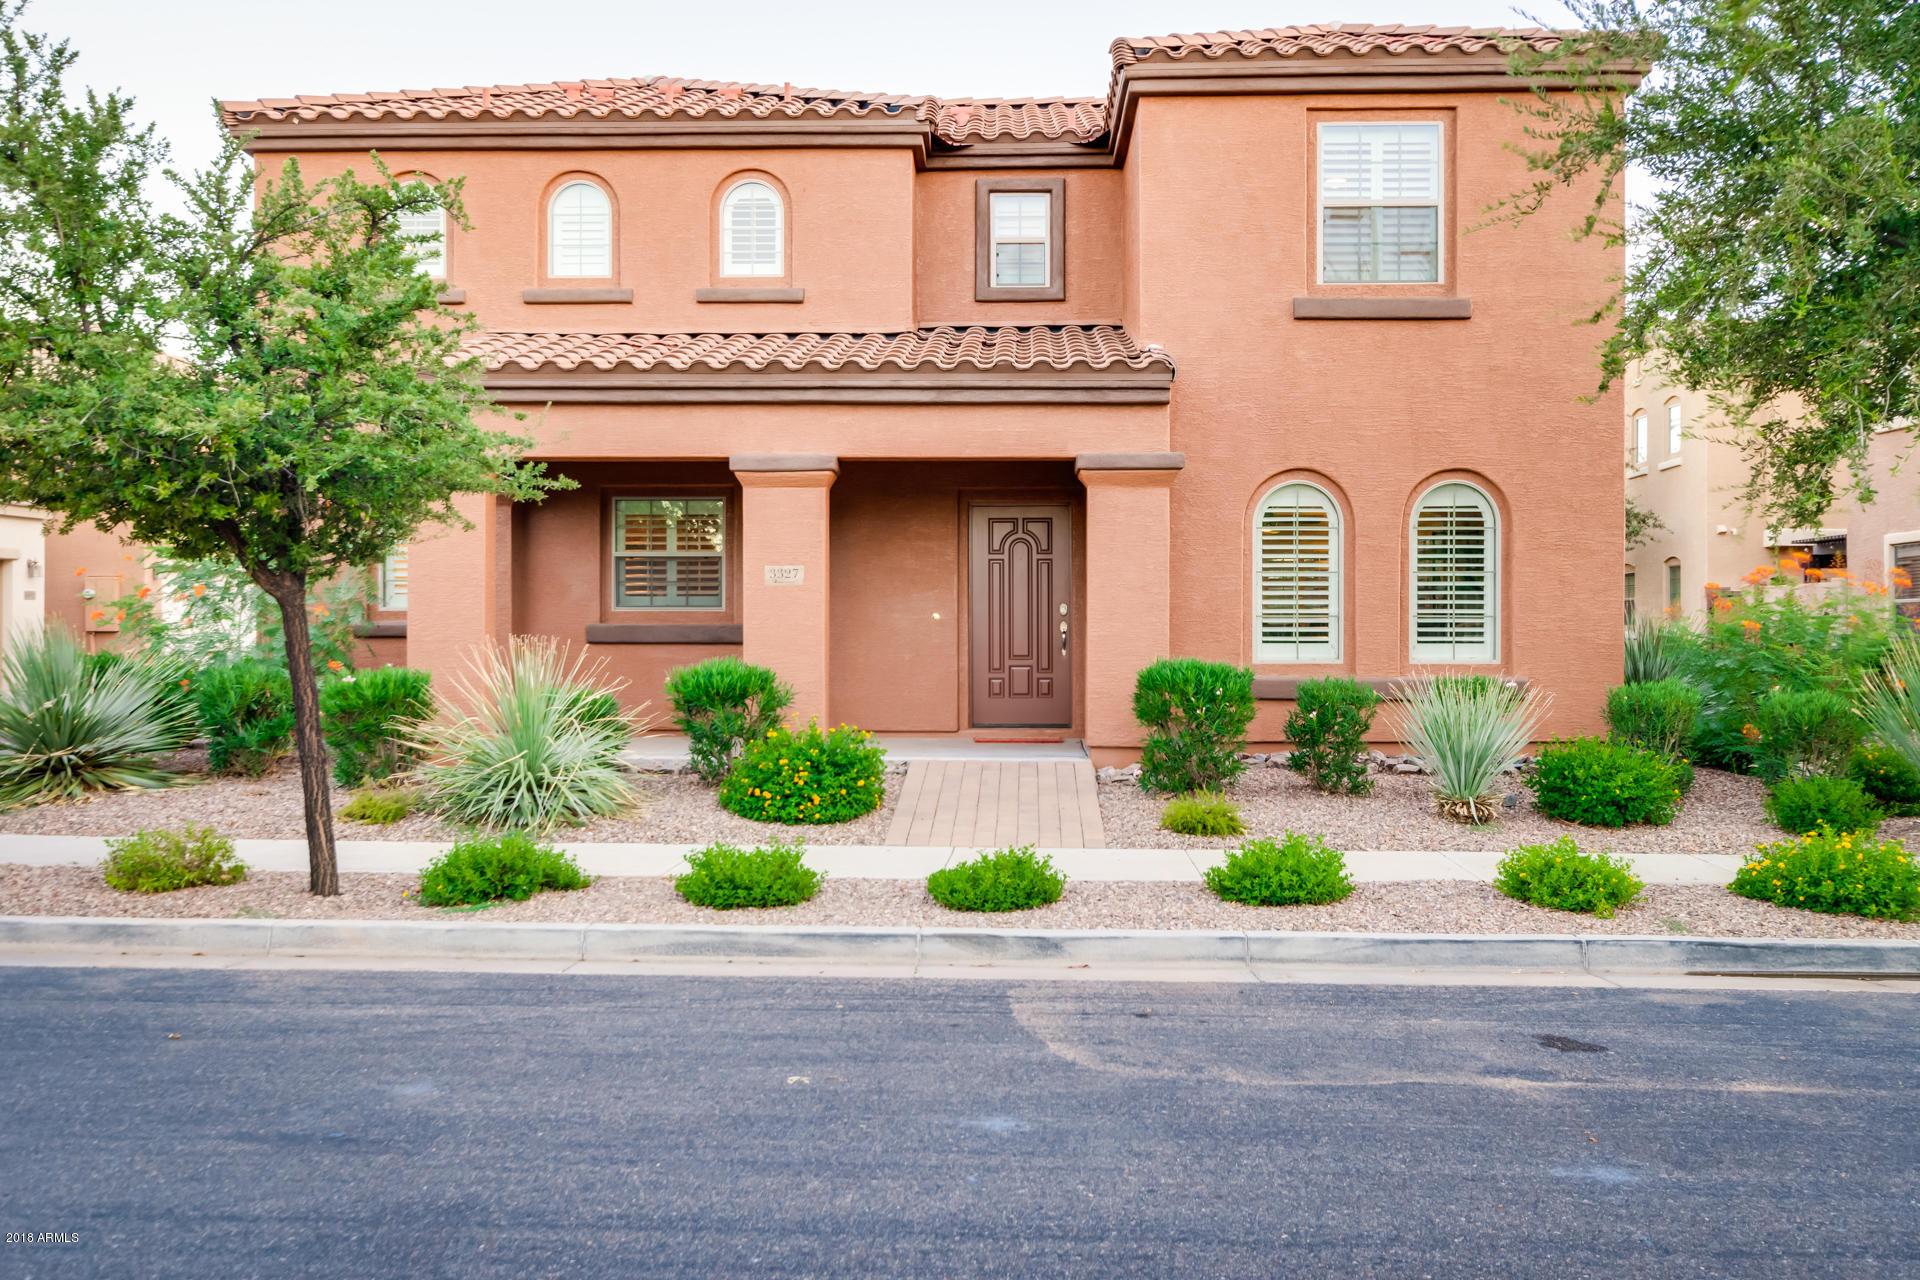 3327 E LOMA VISTA Street, Gilbert, AZ 85295, 3 Bedrooms Bedrooms, ,Residential Lease,For Rent,3327 E LOMA VISTA Street,5987617